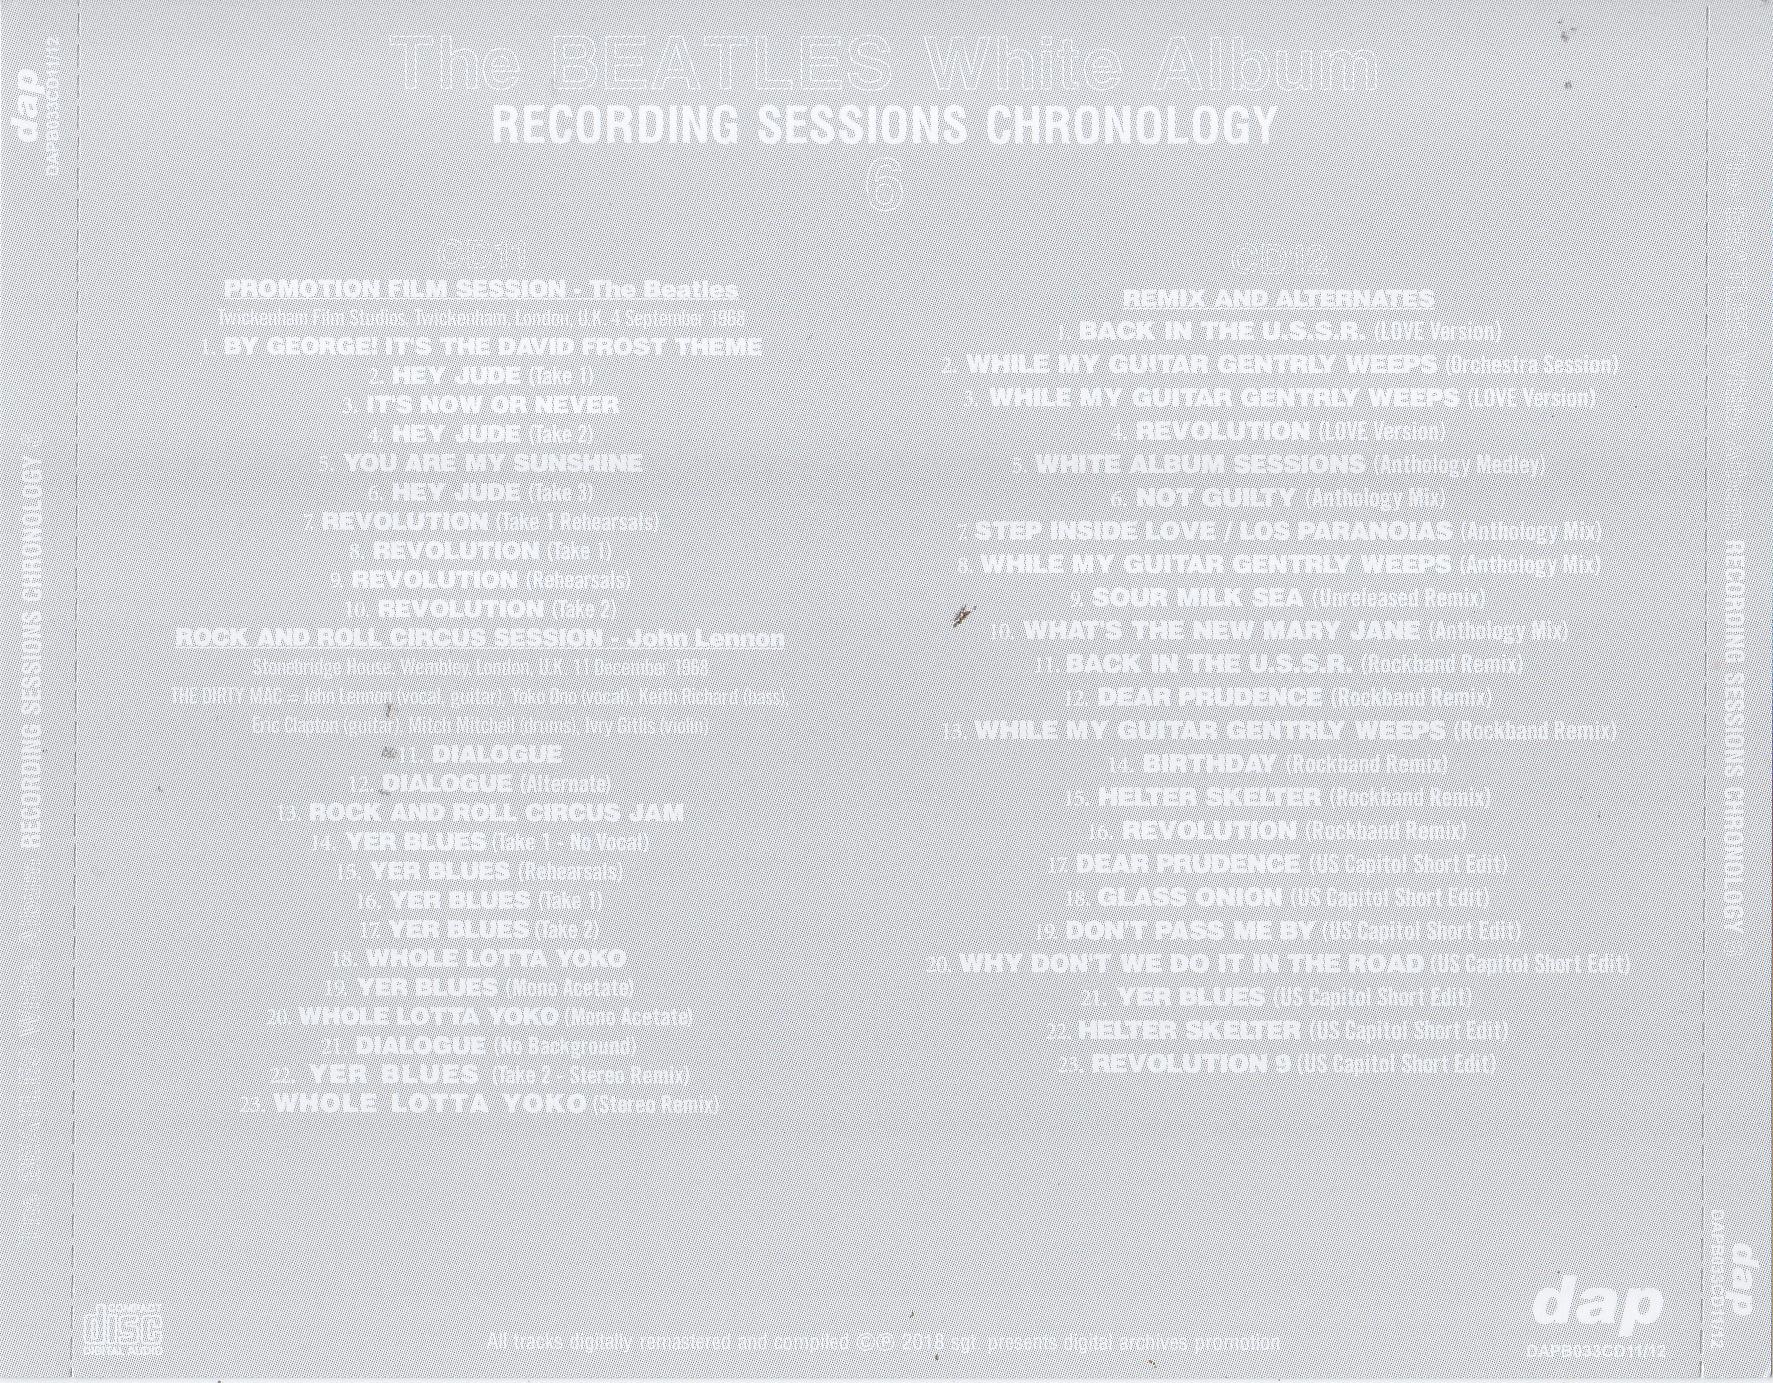 Beatles / White Album Recording Sessions Chronology / 12CD